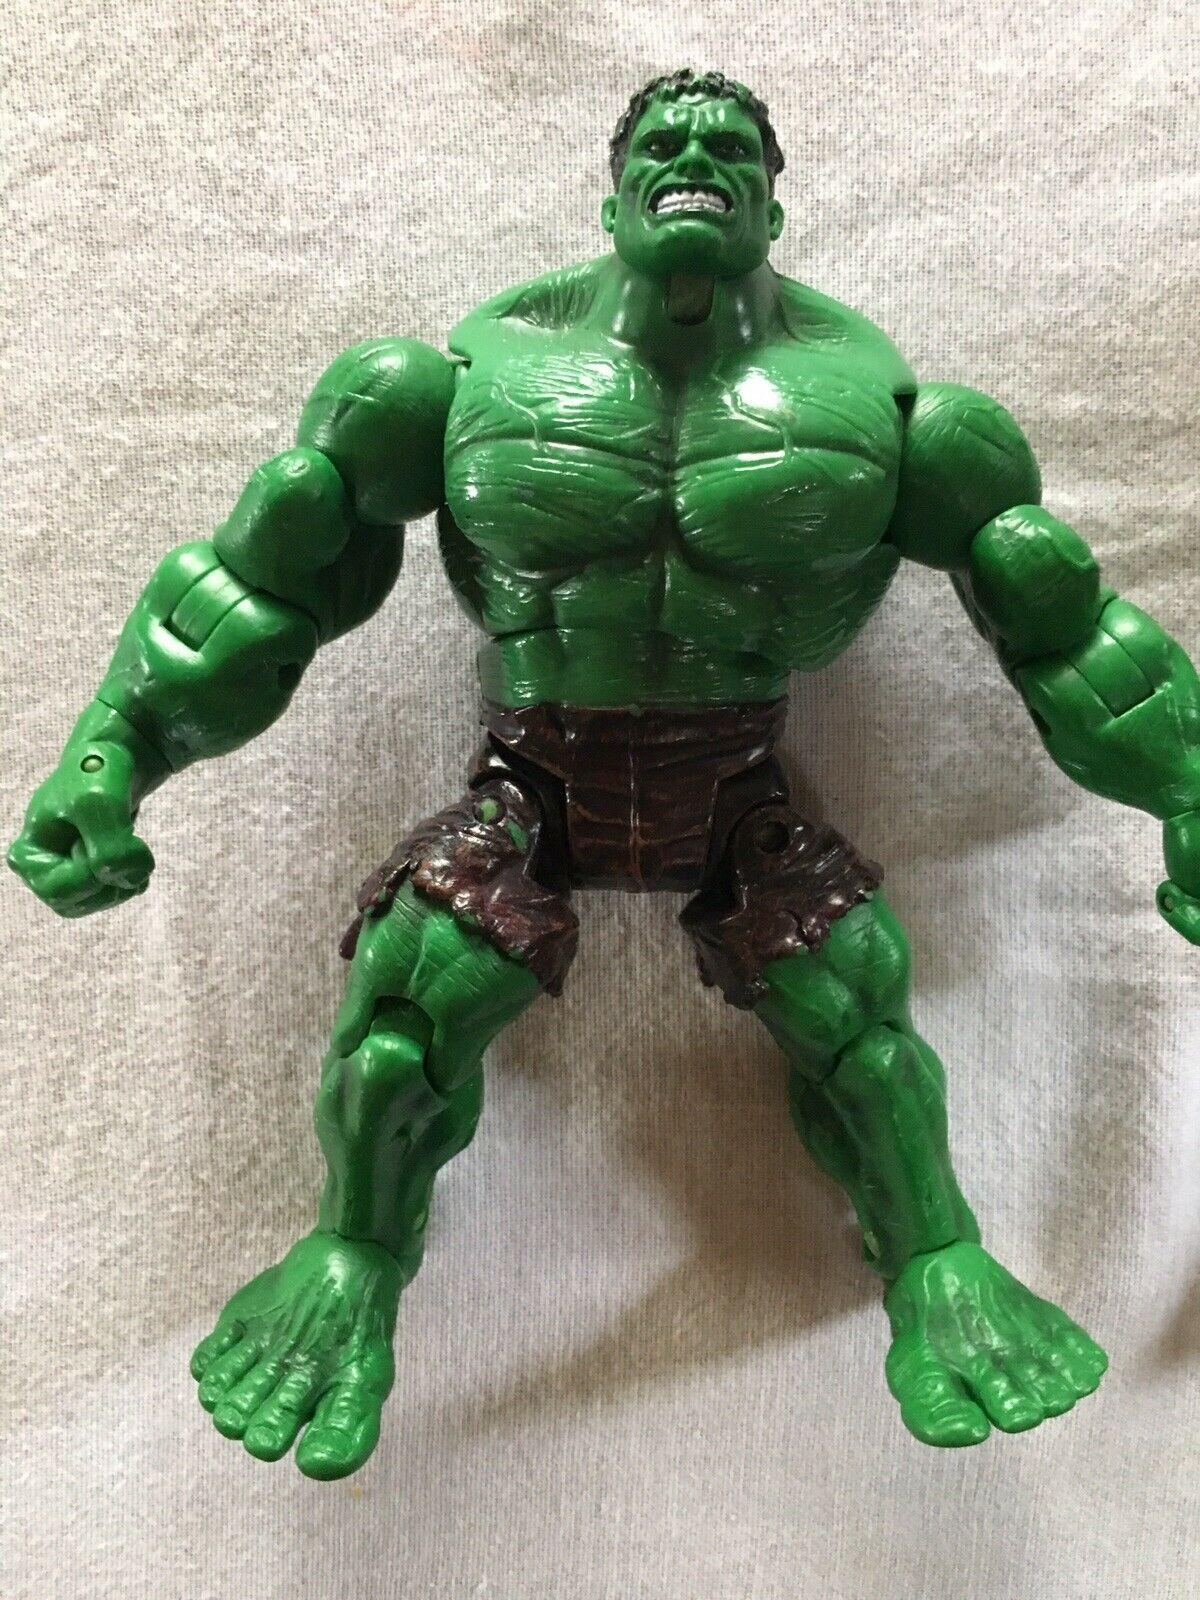 2002 Incredible Hulk action figure